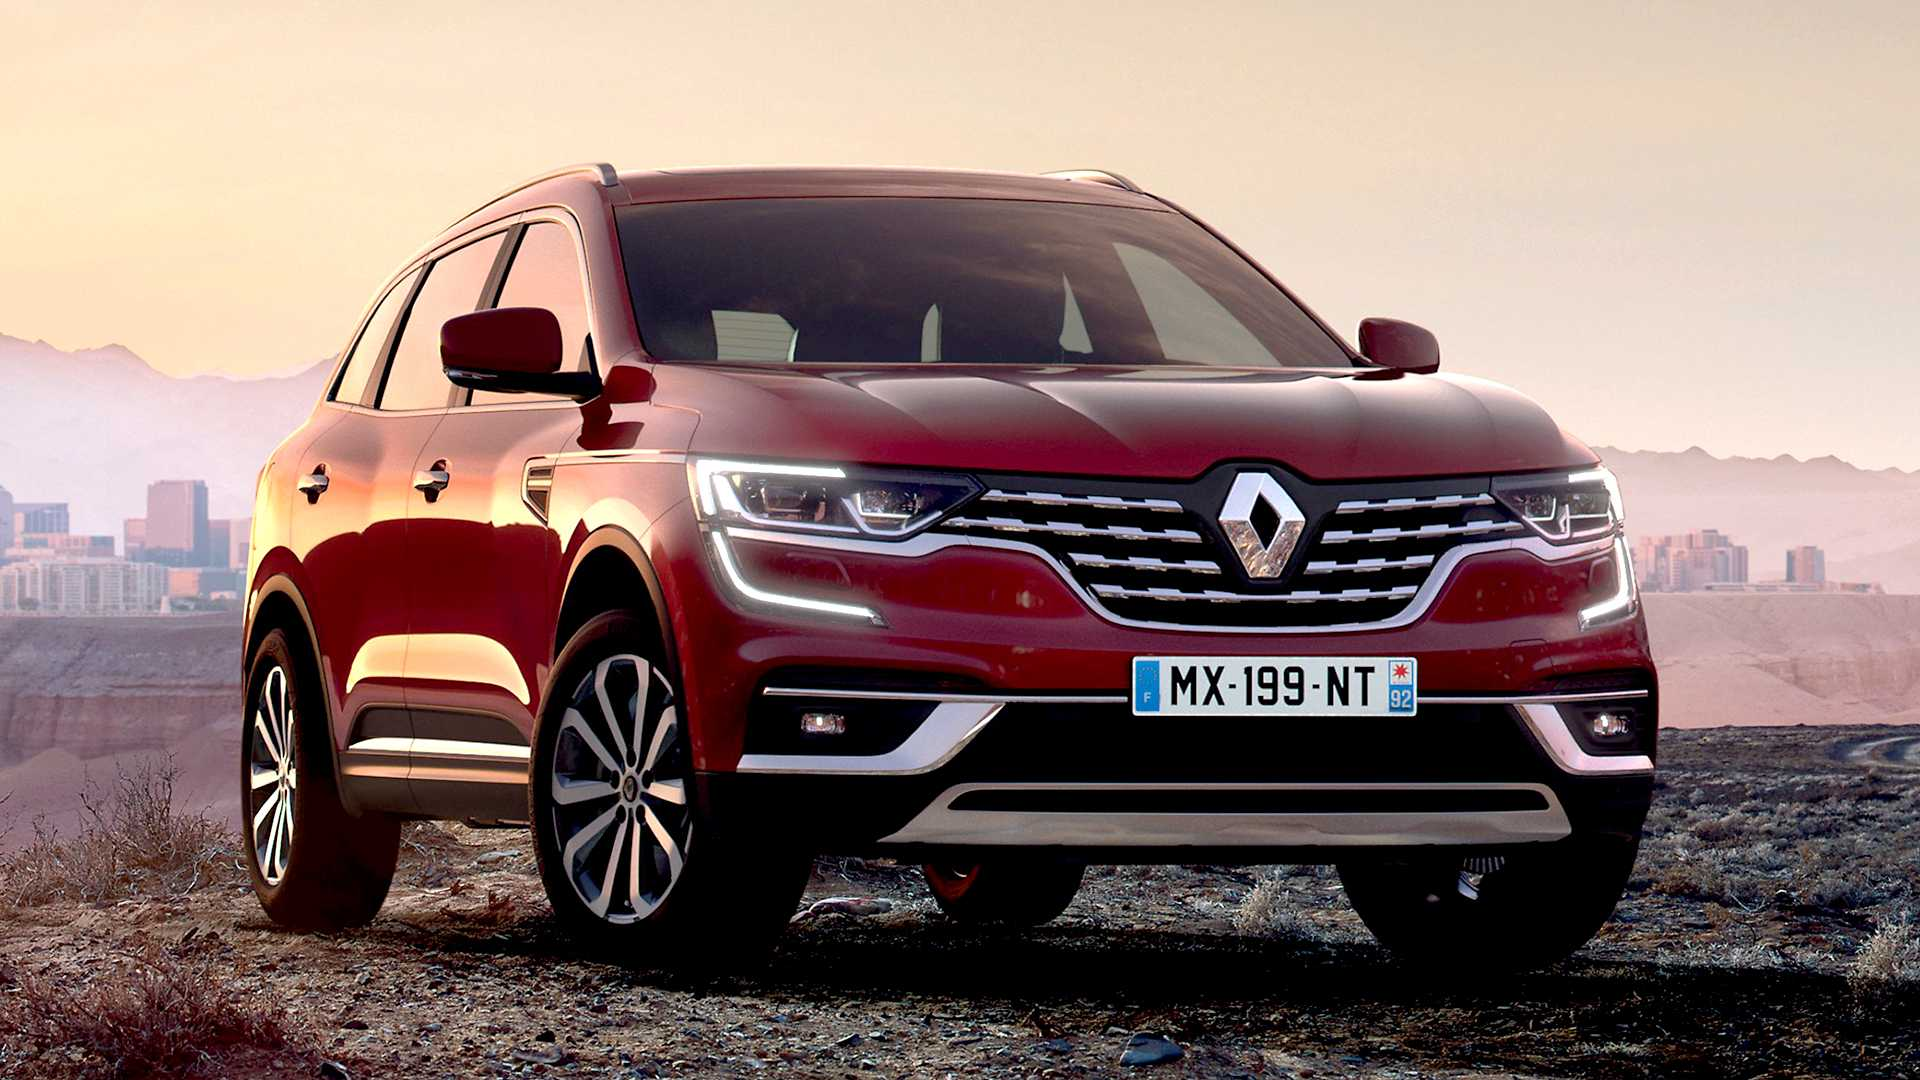 Renault prices up new £28,195 Koleos SUV